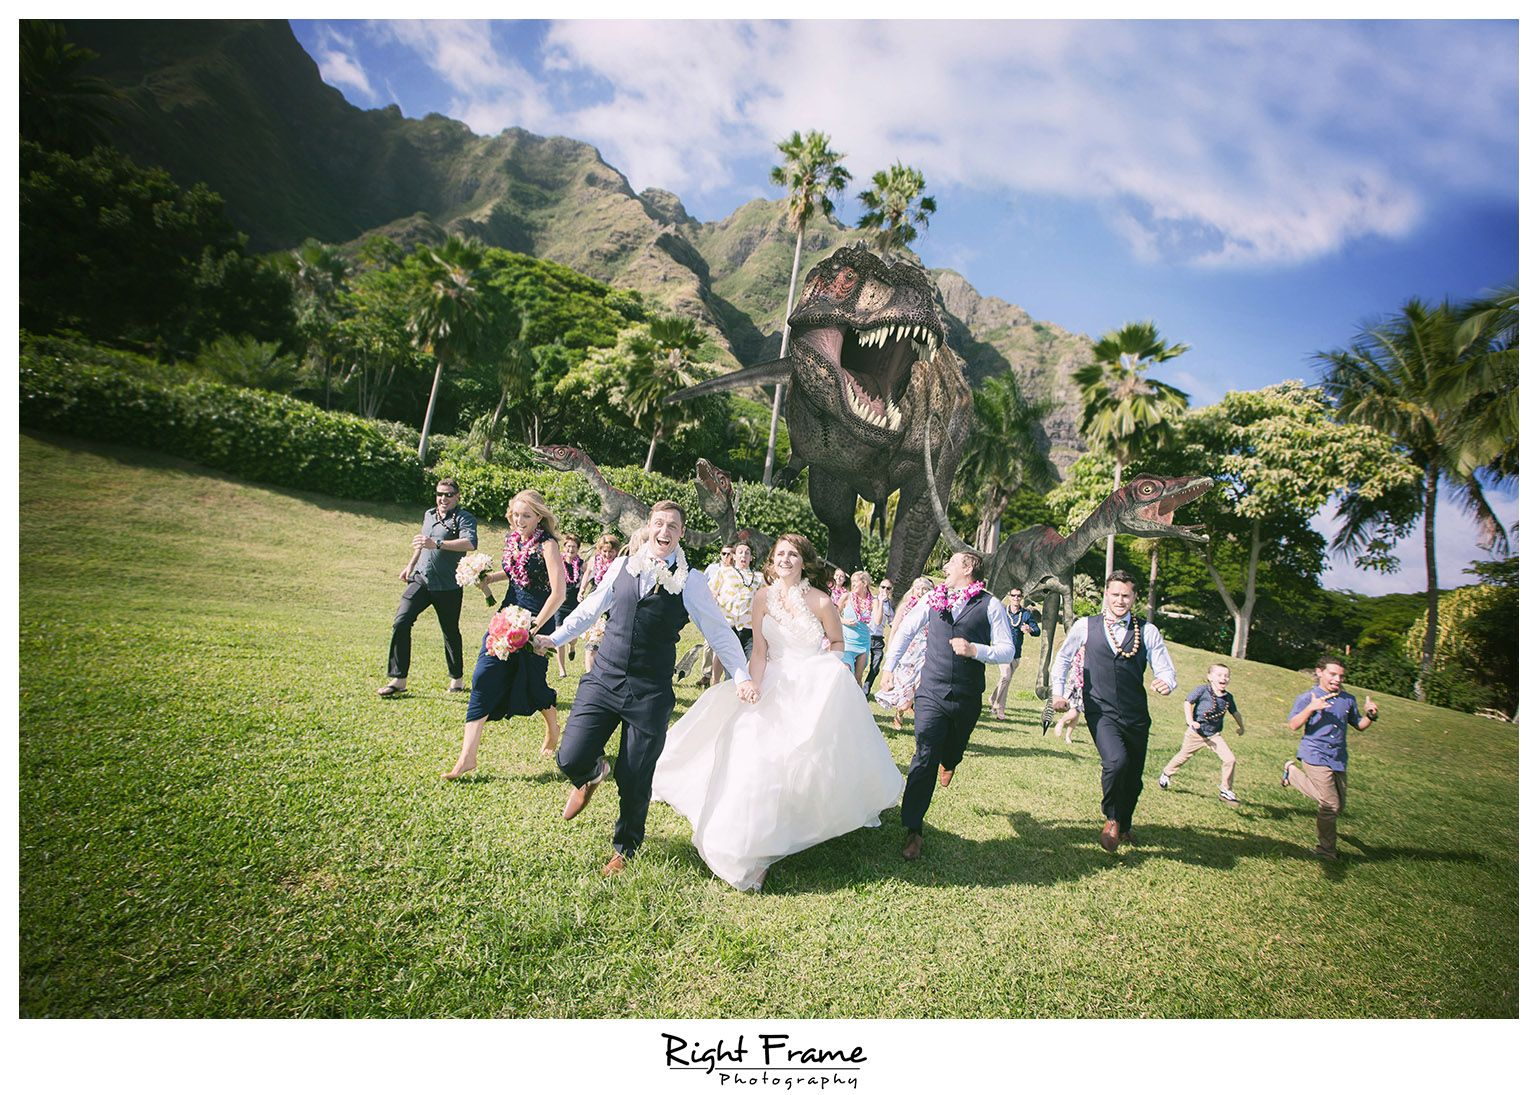 Rightframe Juric Park Dinosaurs At Kualoa Ranch Wedding Paliku